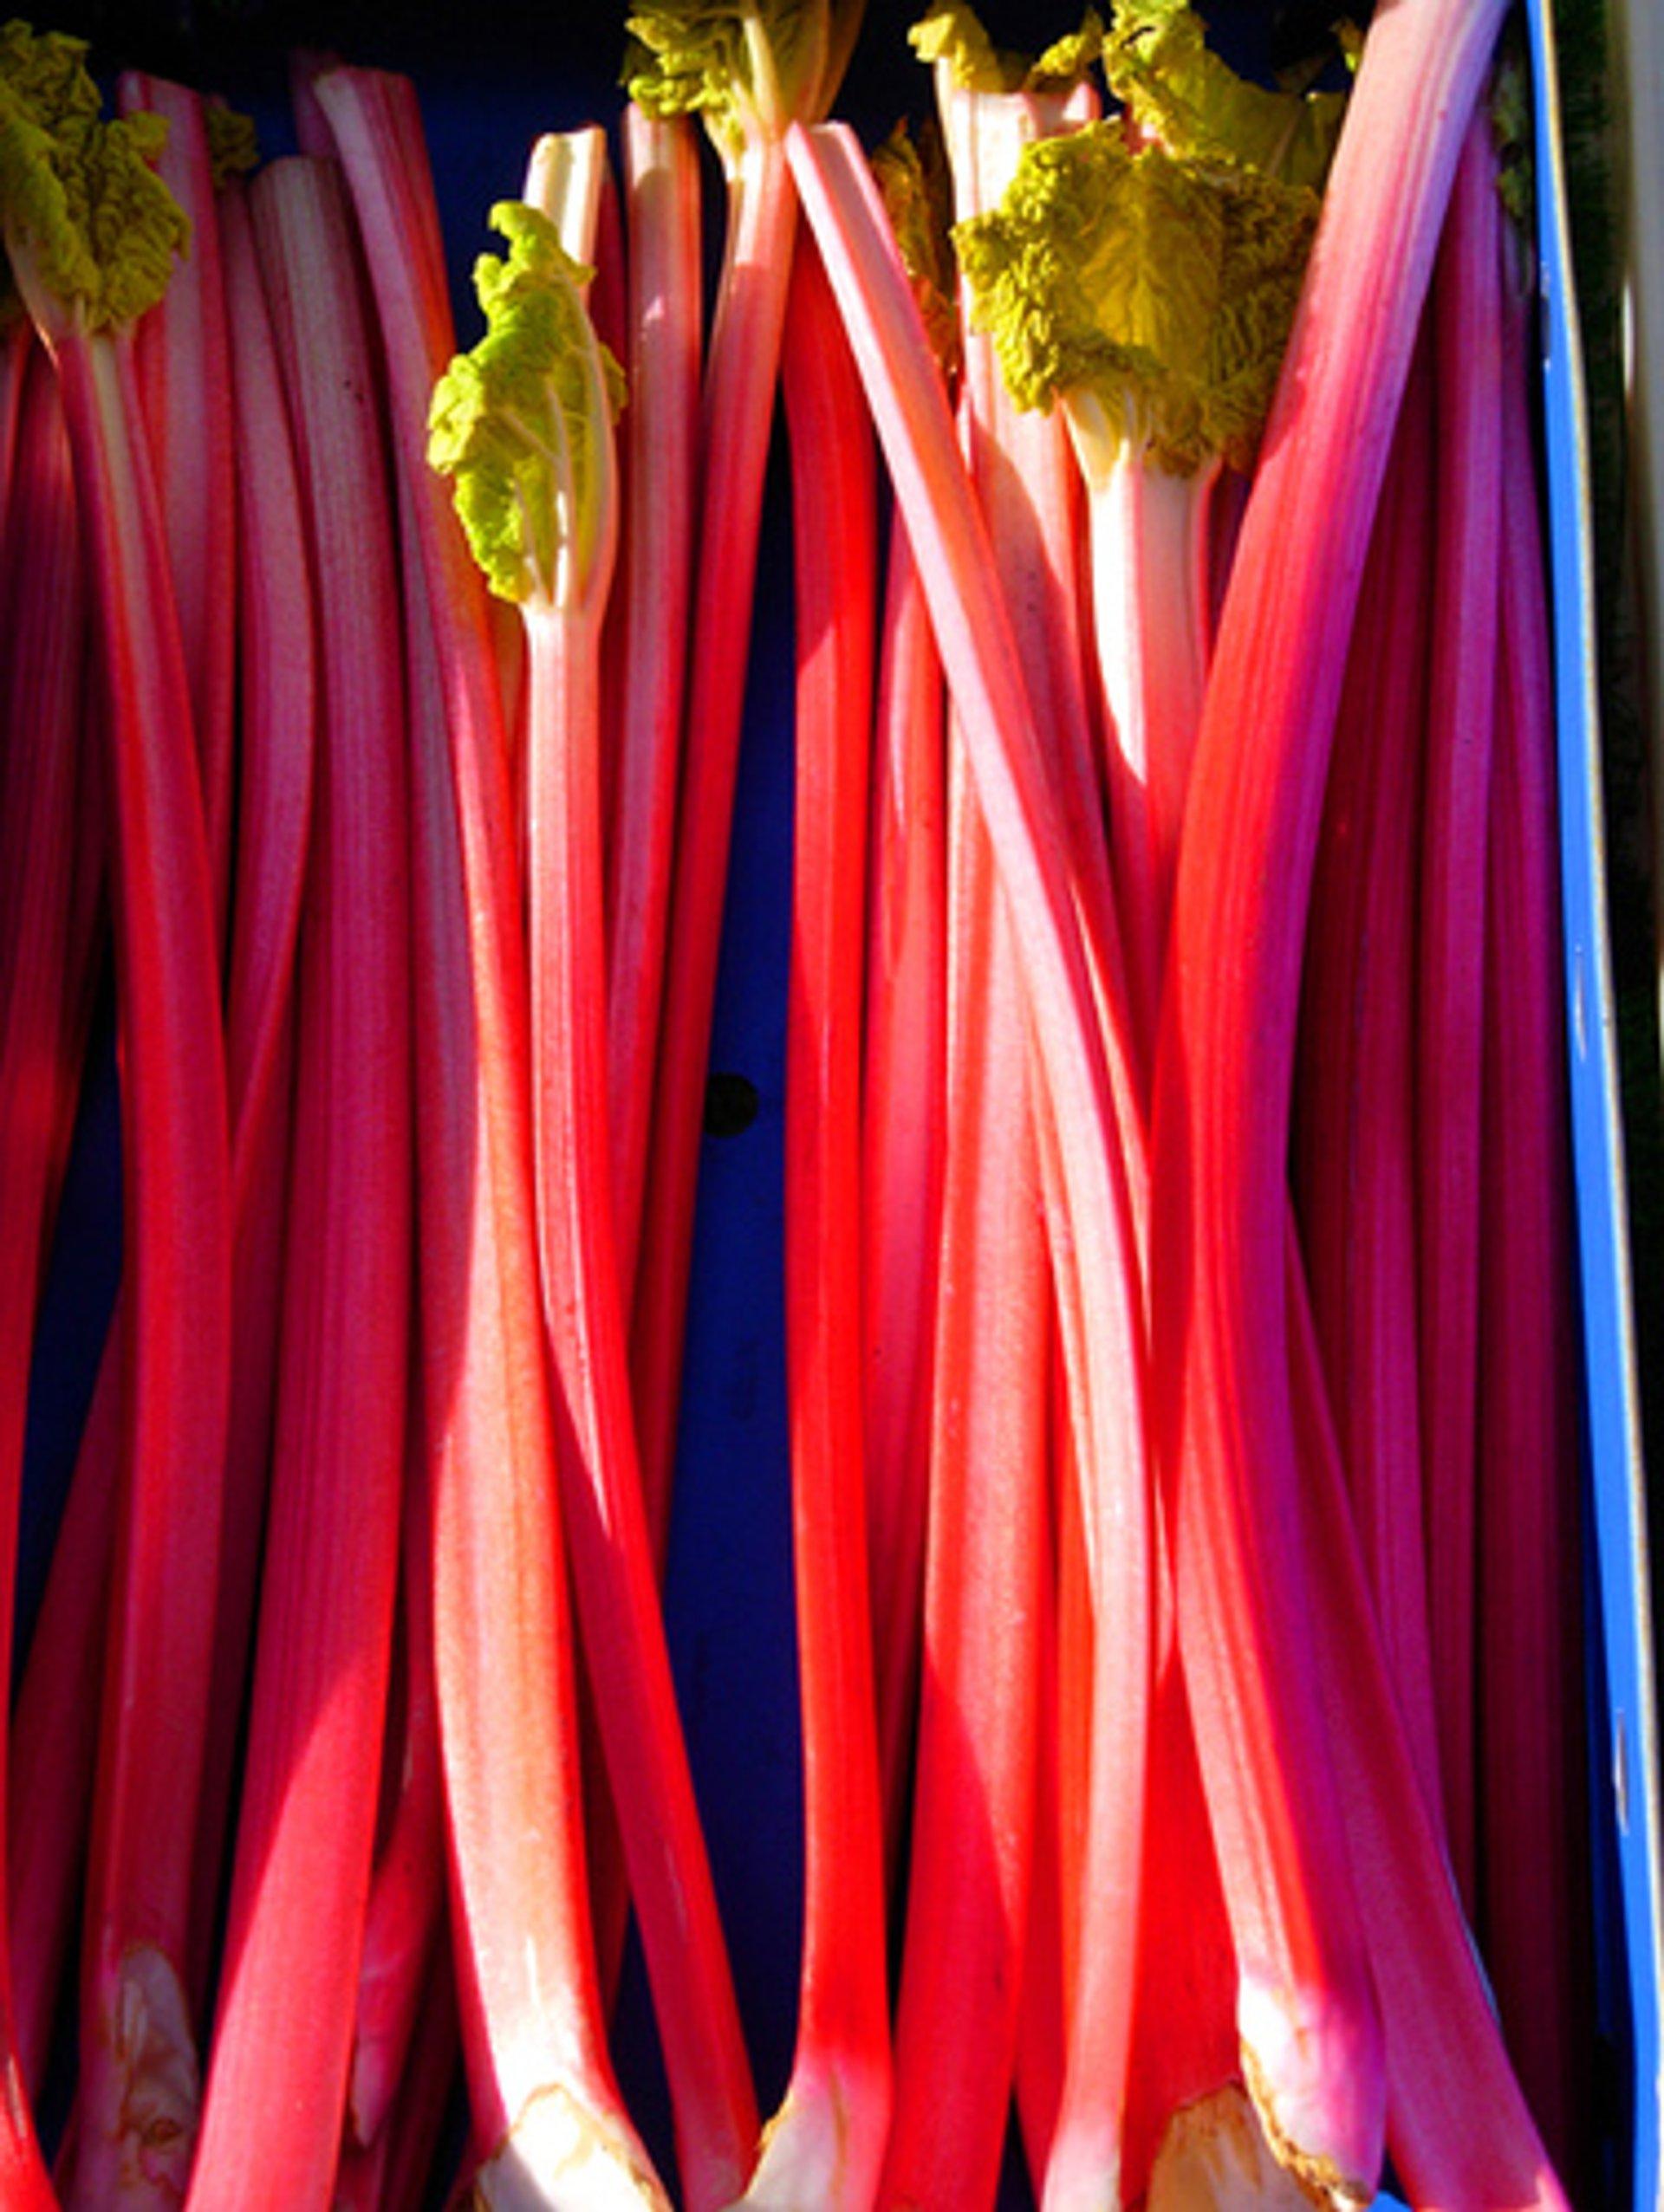 Spring rhubarb 2020